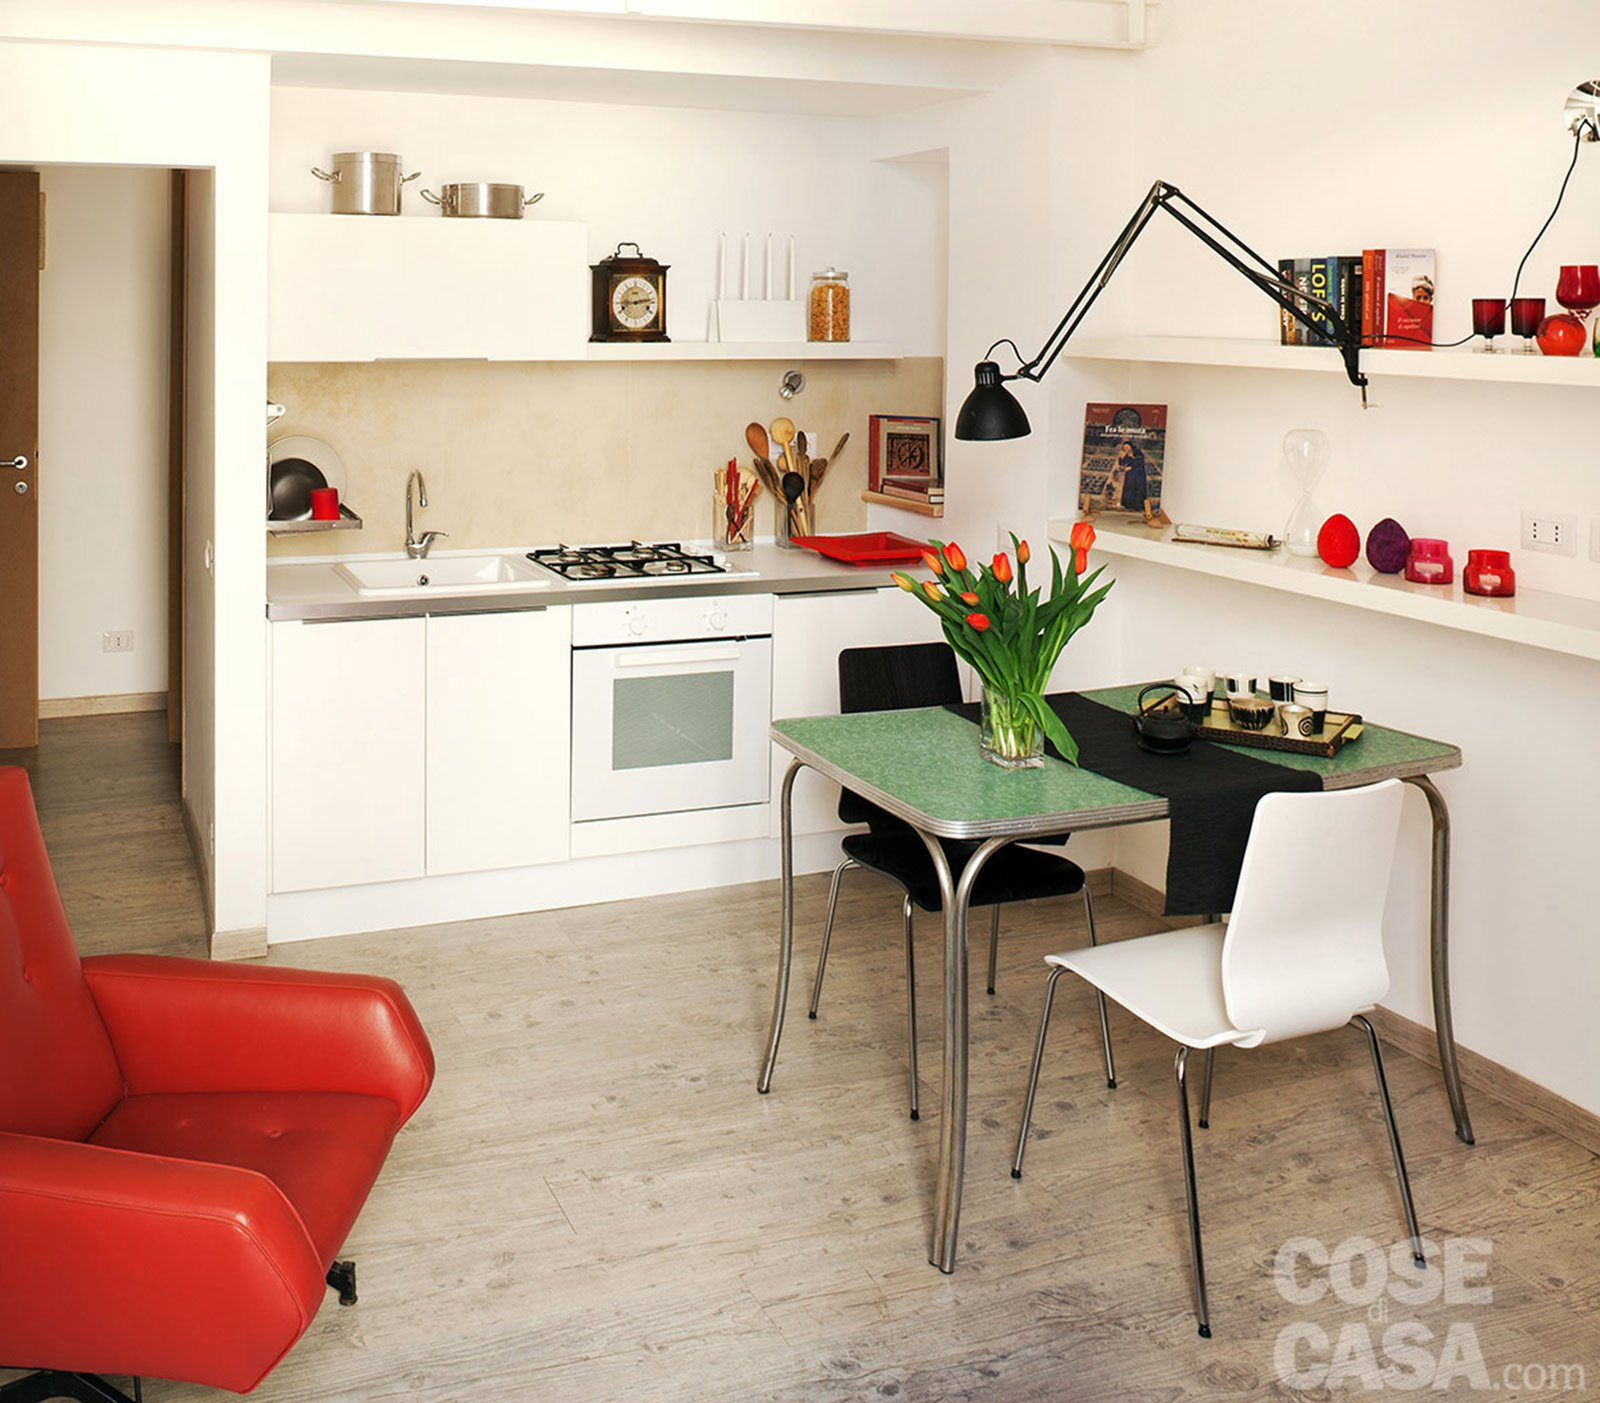 Quadri Cucina Leroy Merlin una casa che punta al risparmio - cose di casa